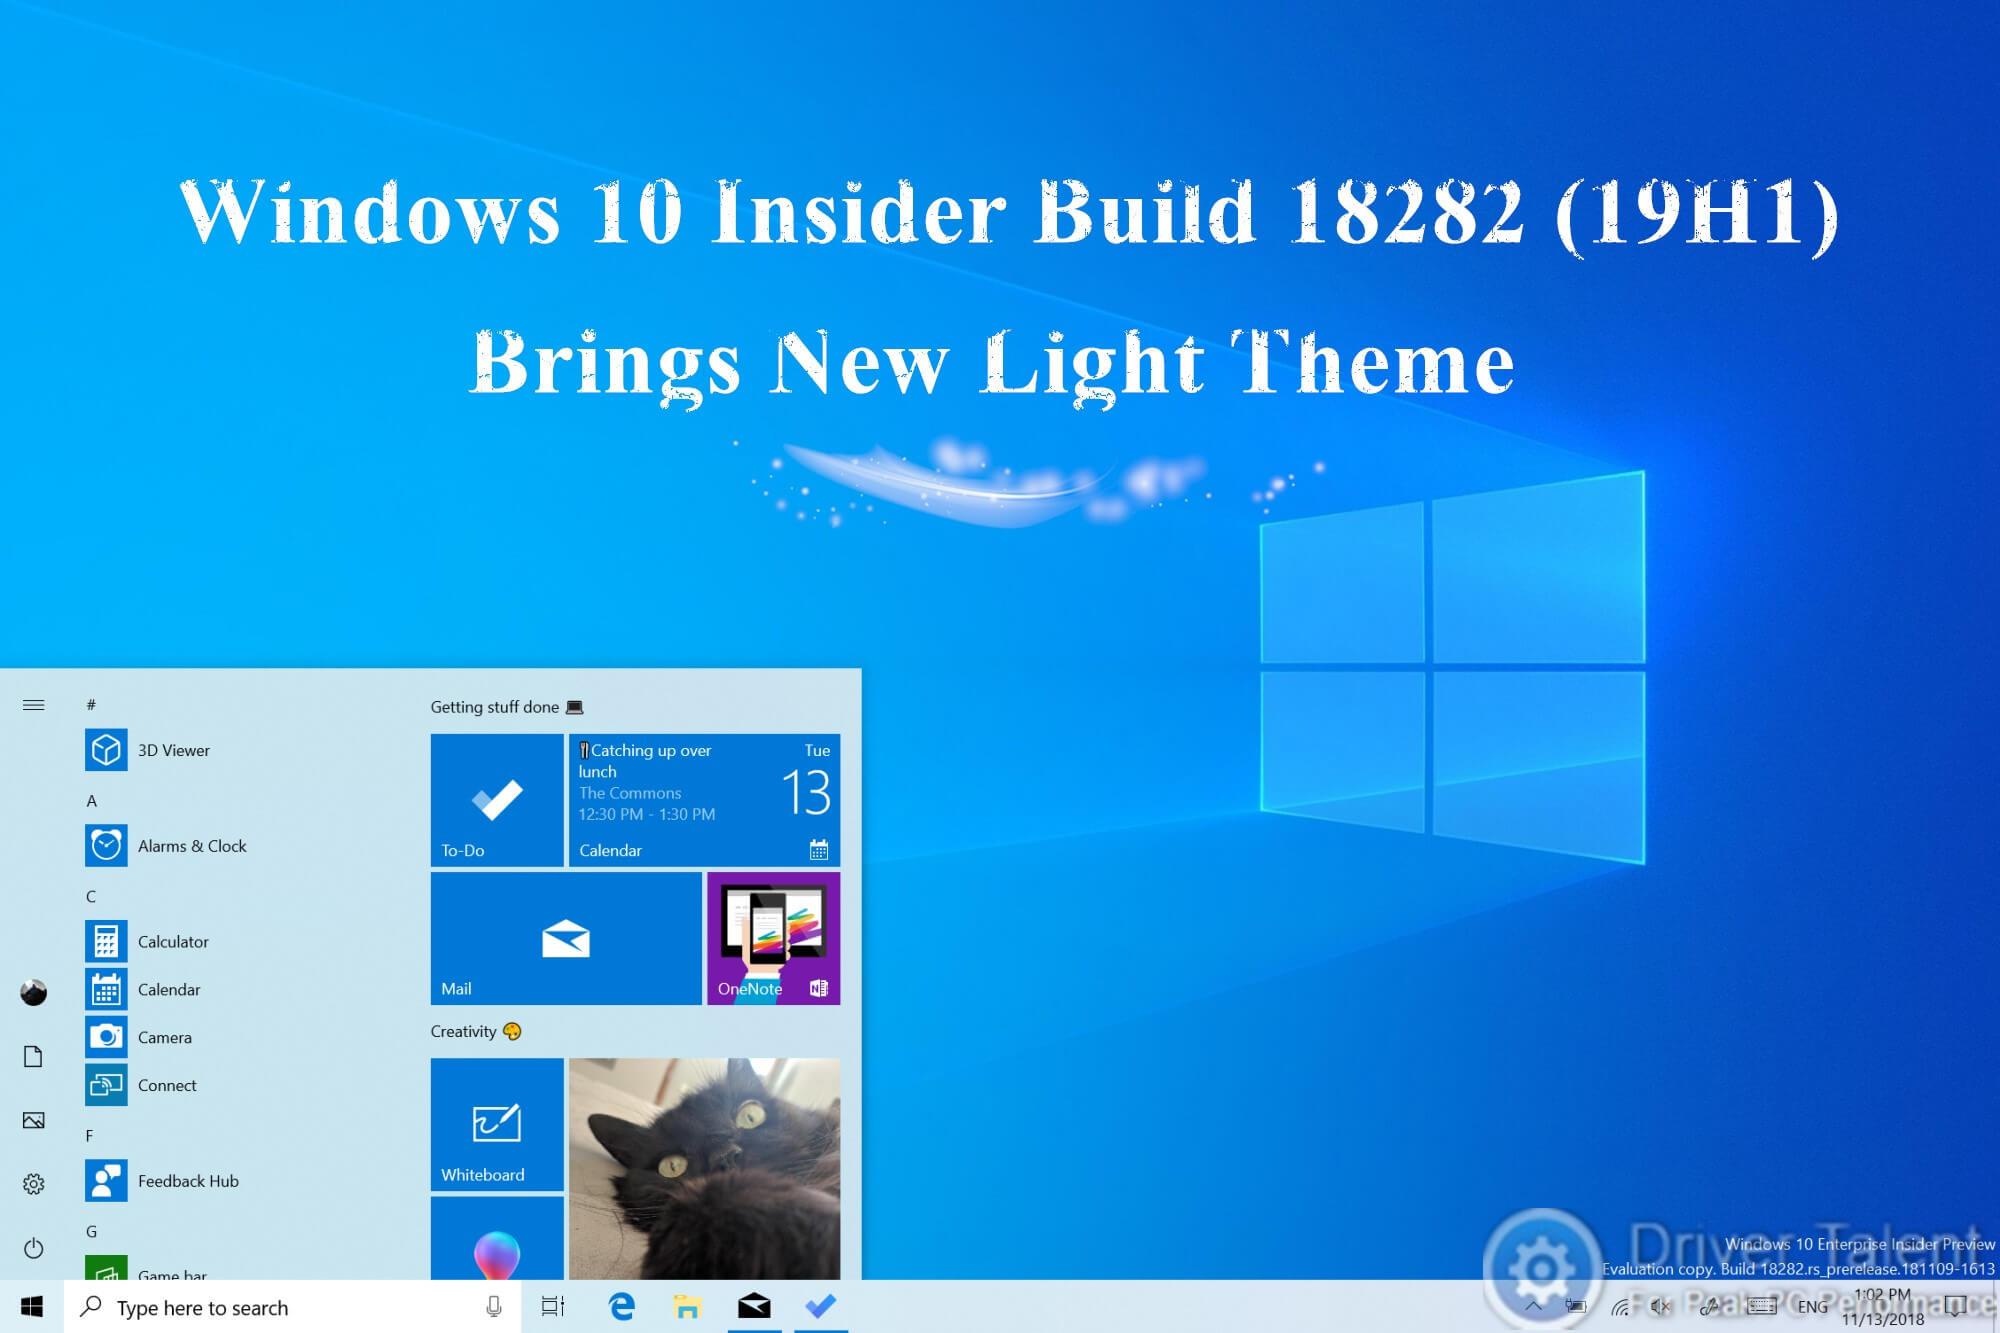 Windows 10 Insider Build 18282 (19H1) Brings New Light Theme